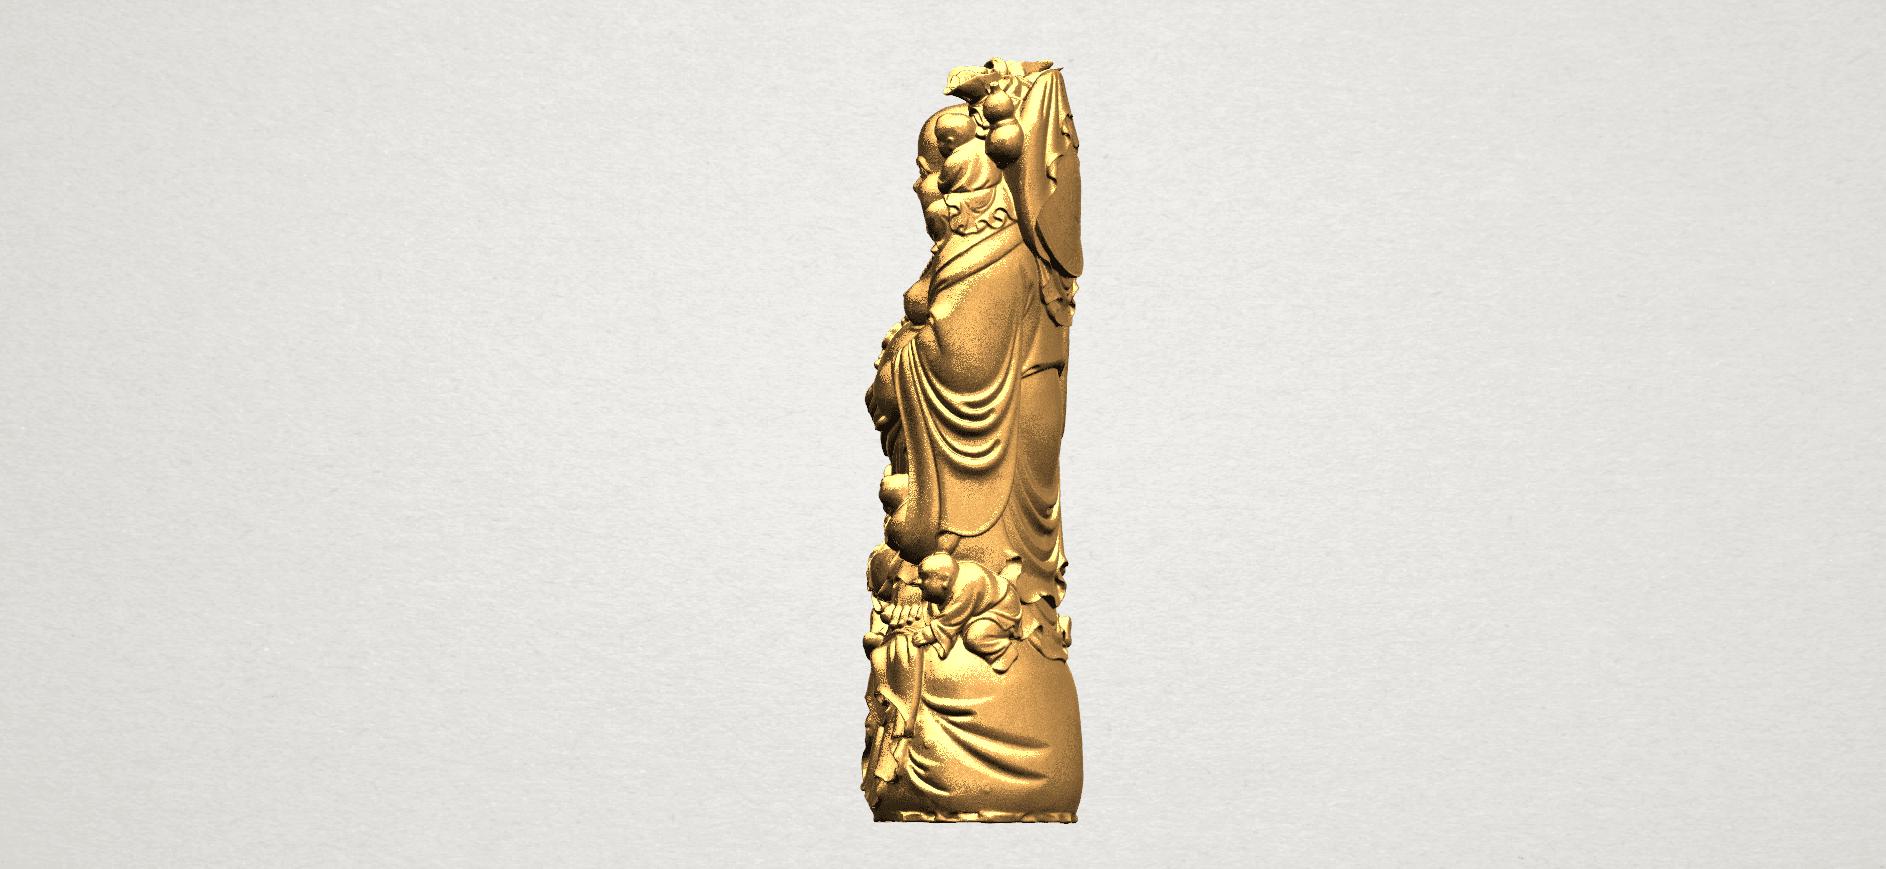 TDA0070 Metteyya Buddha 02 - 88mm - A03.png Download free STL file Metteyya Buddha 02 • 3D printer object, GeorgesNikkei